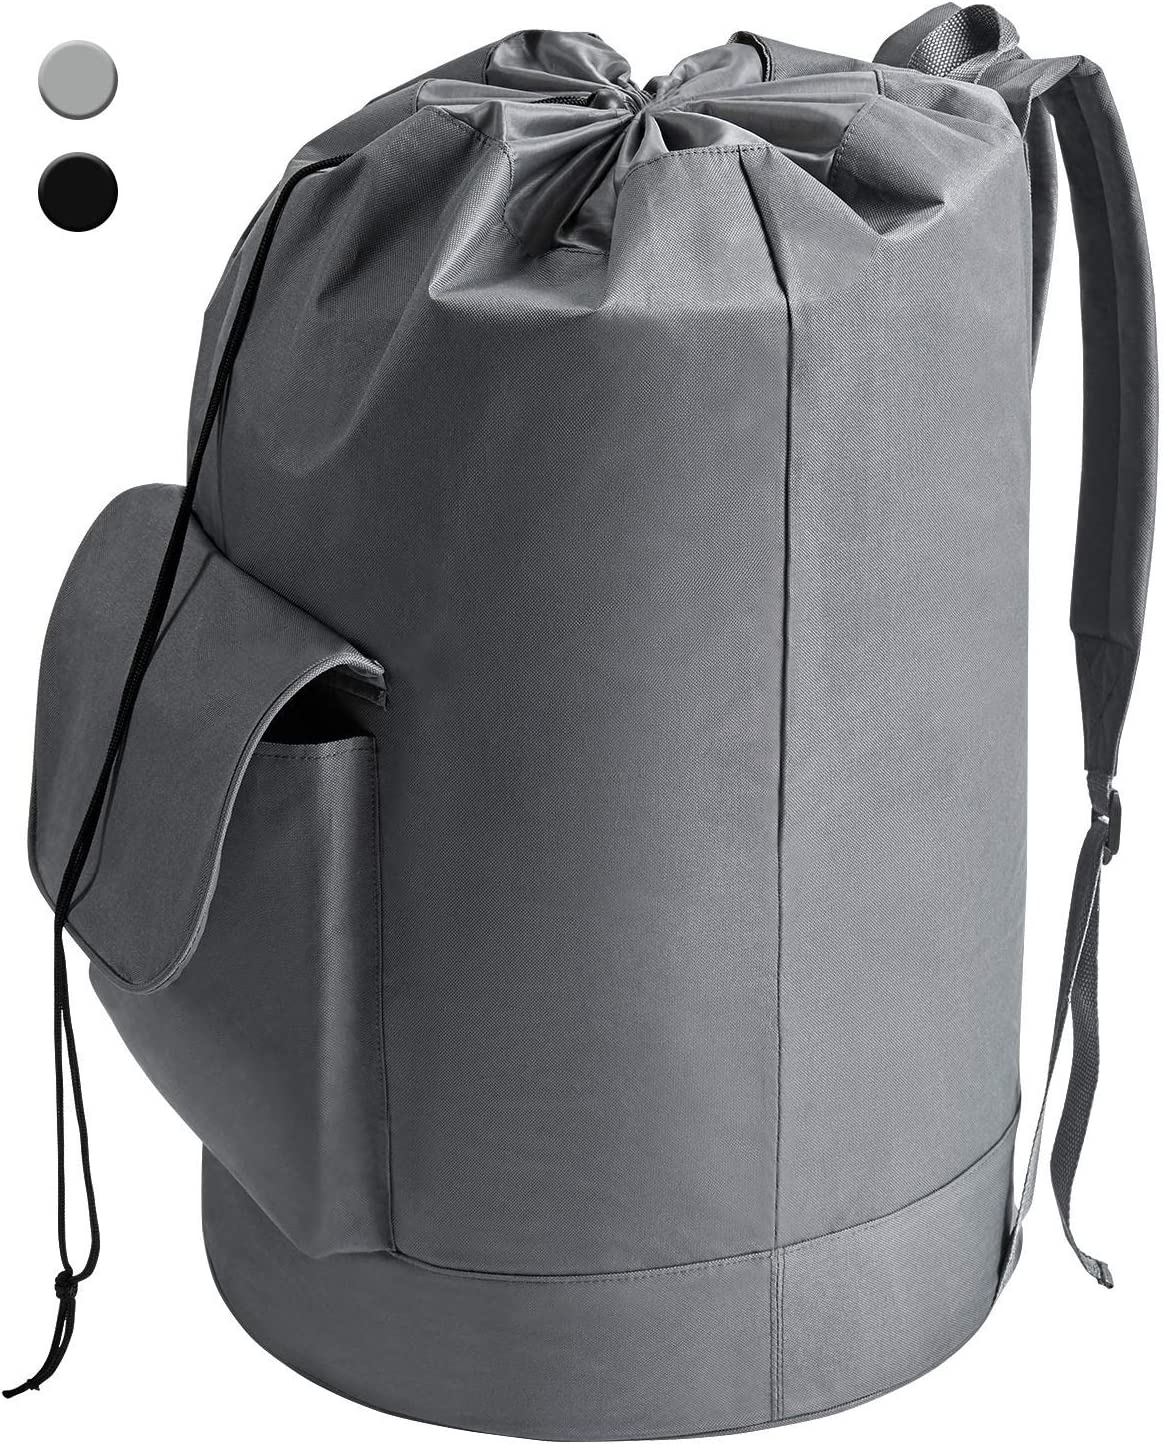 YOUDENOVA Laundry Bag Backpack Waterproof Freestanding Durable Oxford Backpack Grey Hamper with Padded Adjustable Shoulder Straps for College Dorm, Bedroom, Bathroom, Laundromat (16x30 Inch 94L)